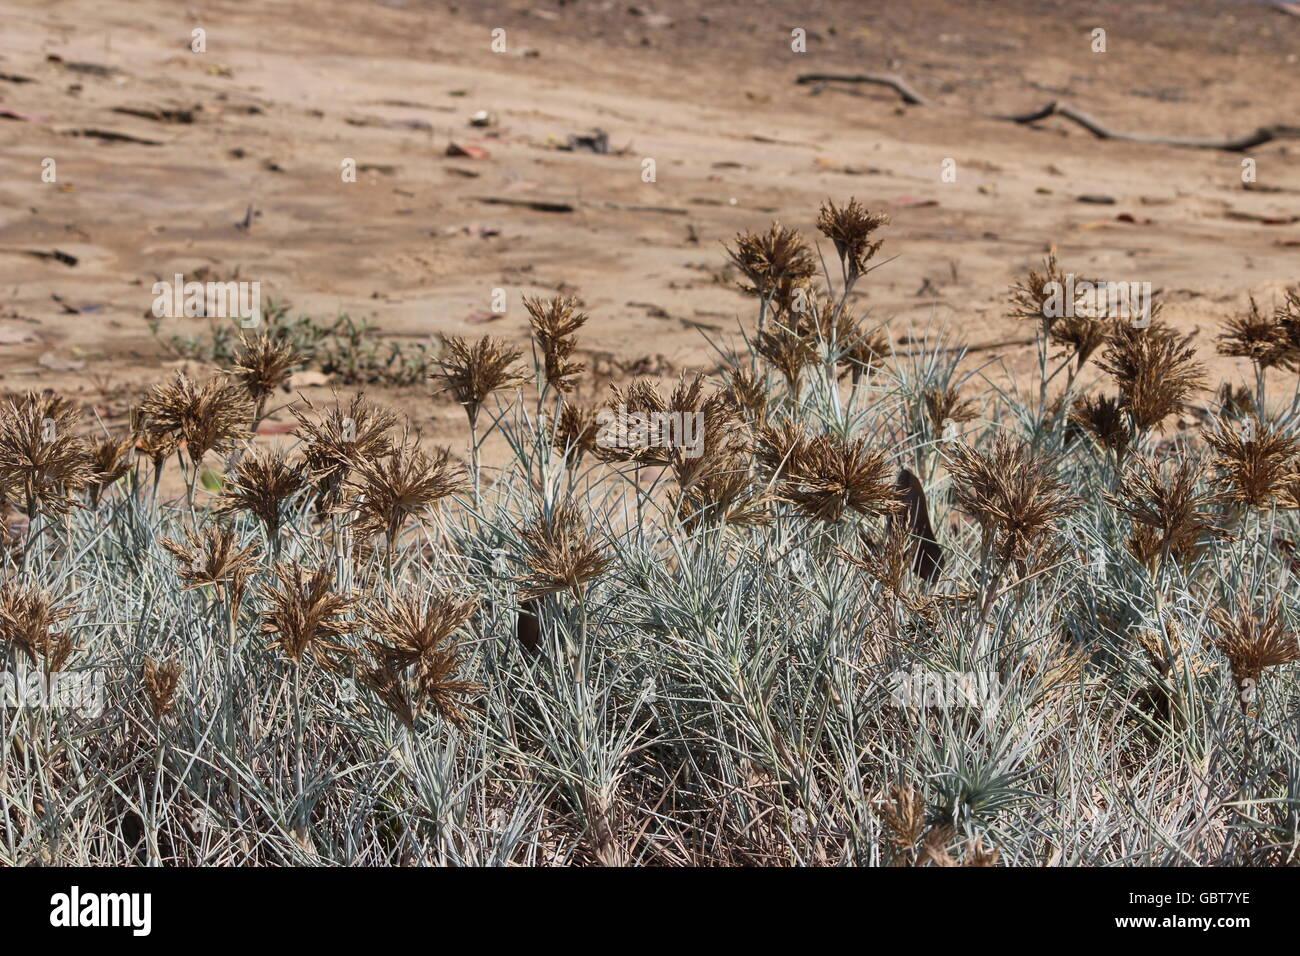 Beach Shrubs or Dry flowers on the Beach - Stock Image